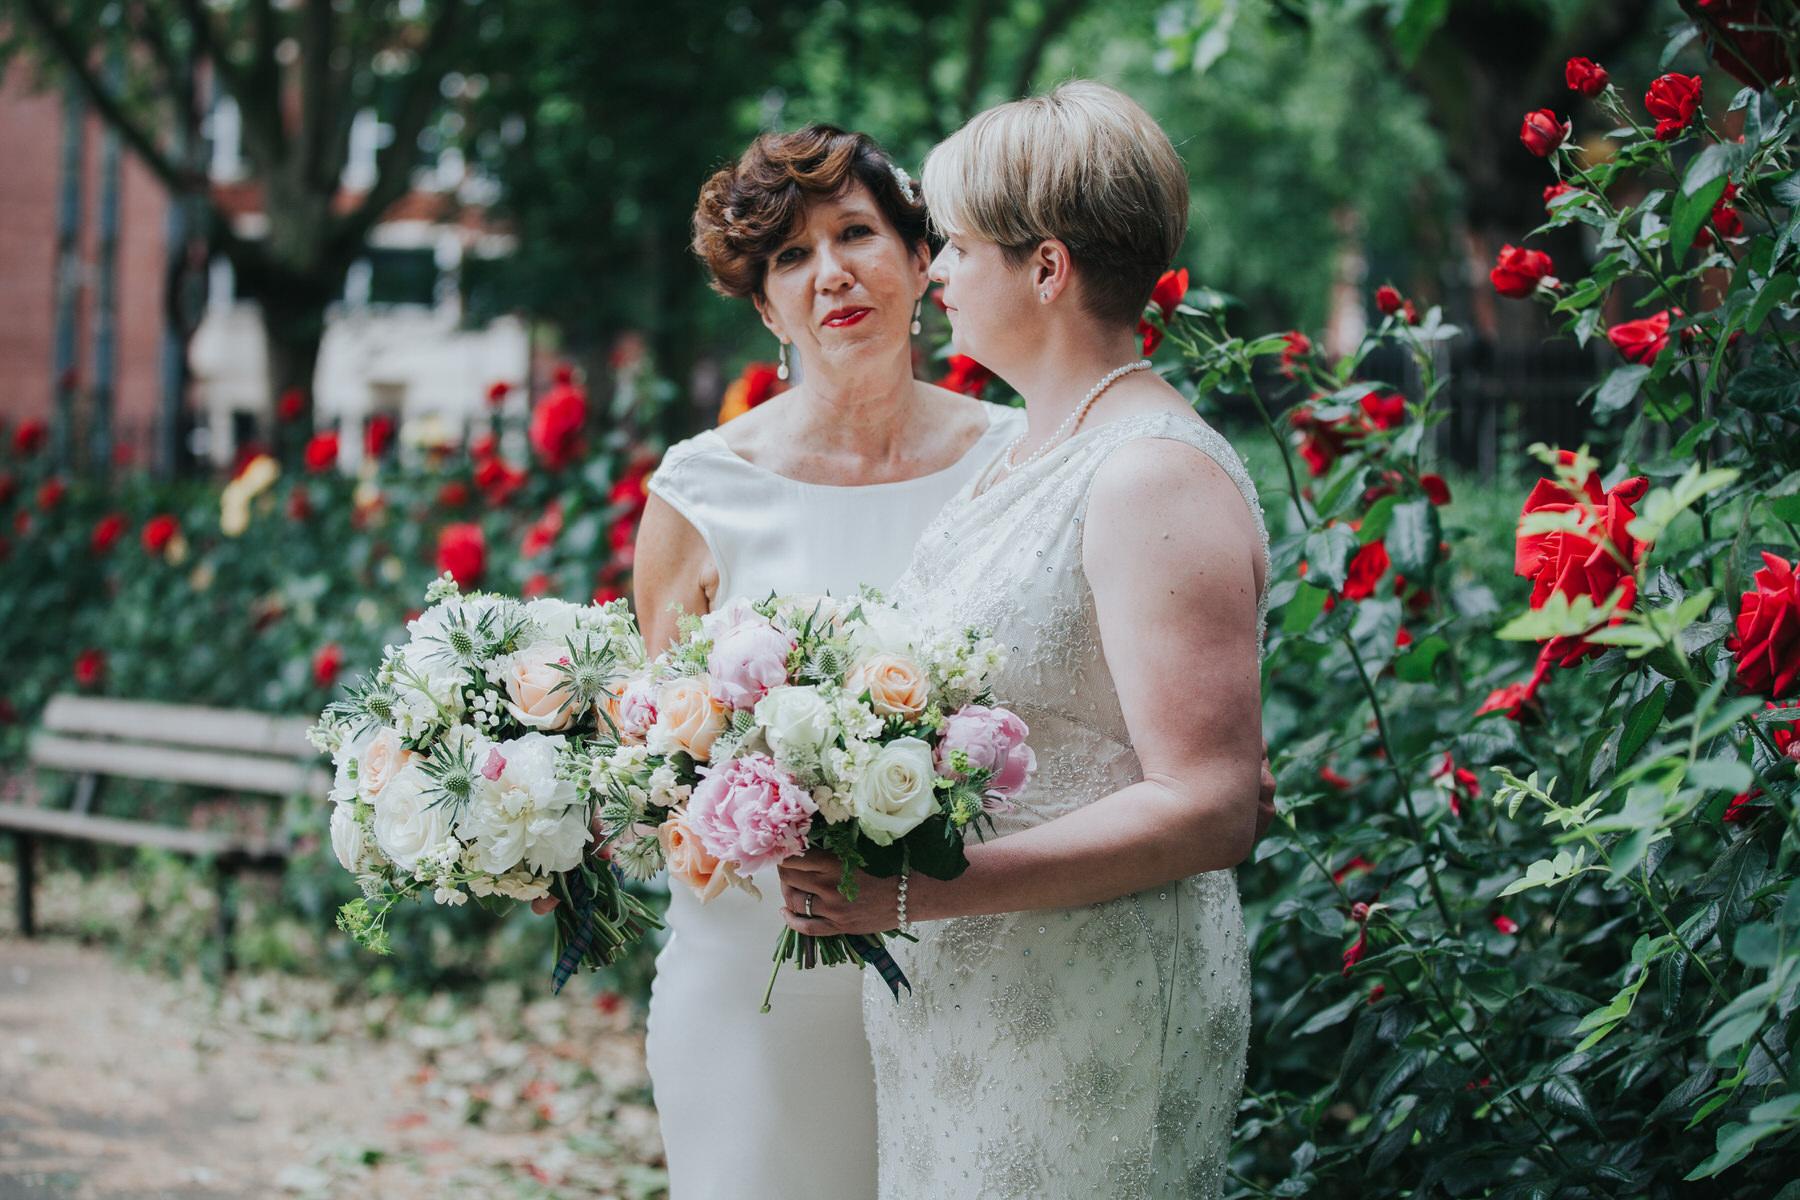 175 London reportage wedding photographer two brides couple portraits.jpg